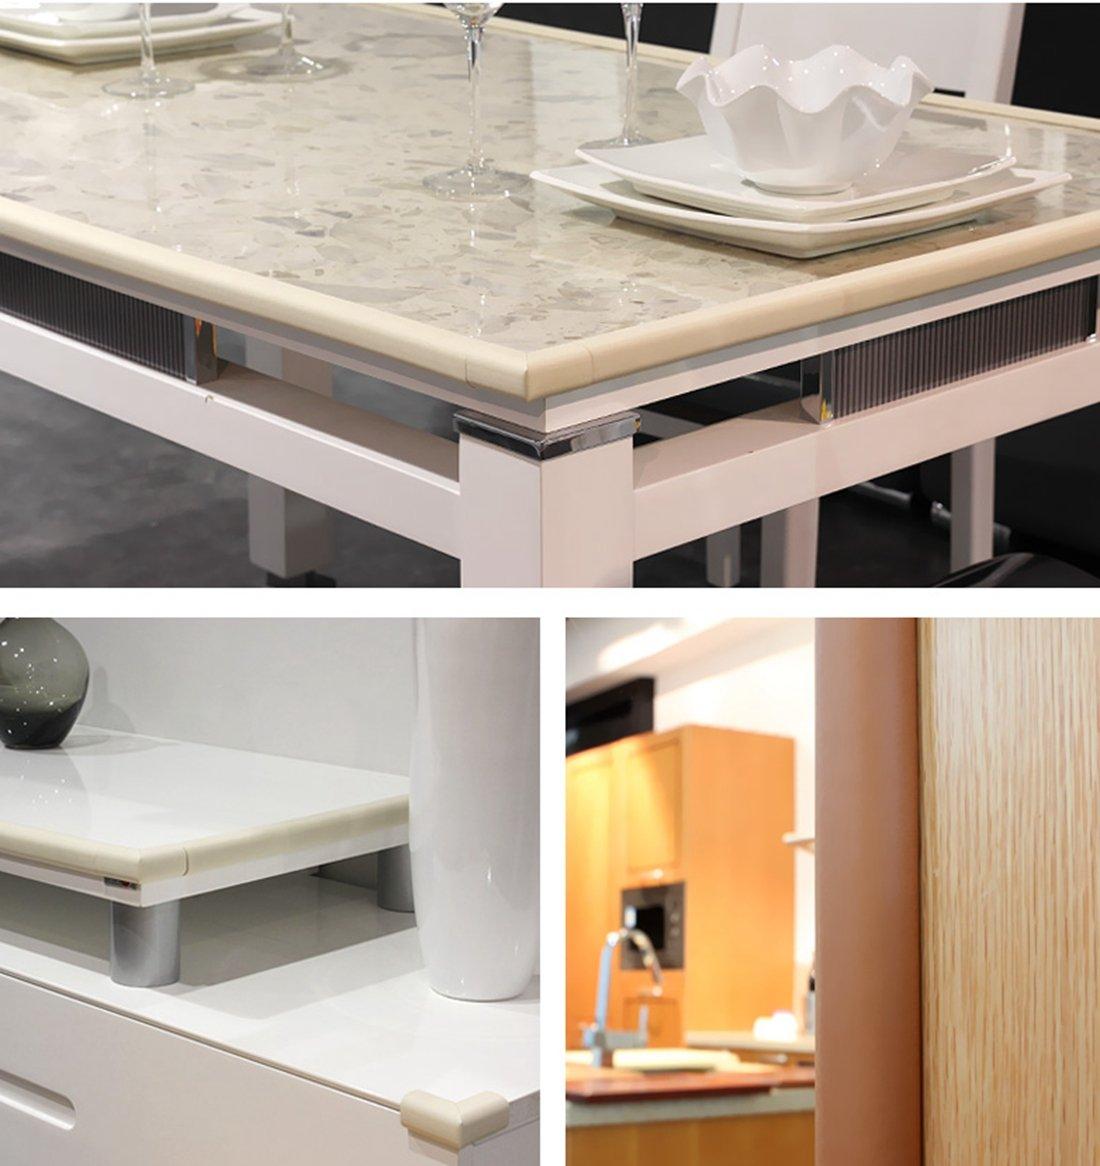 White M2cbridge L Shape Extra Thick Furniture Table Edge Protectors Foam Baby Safety Bumper Guard 2 M